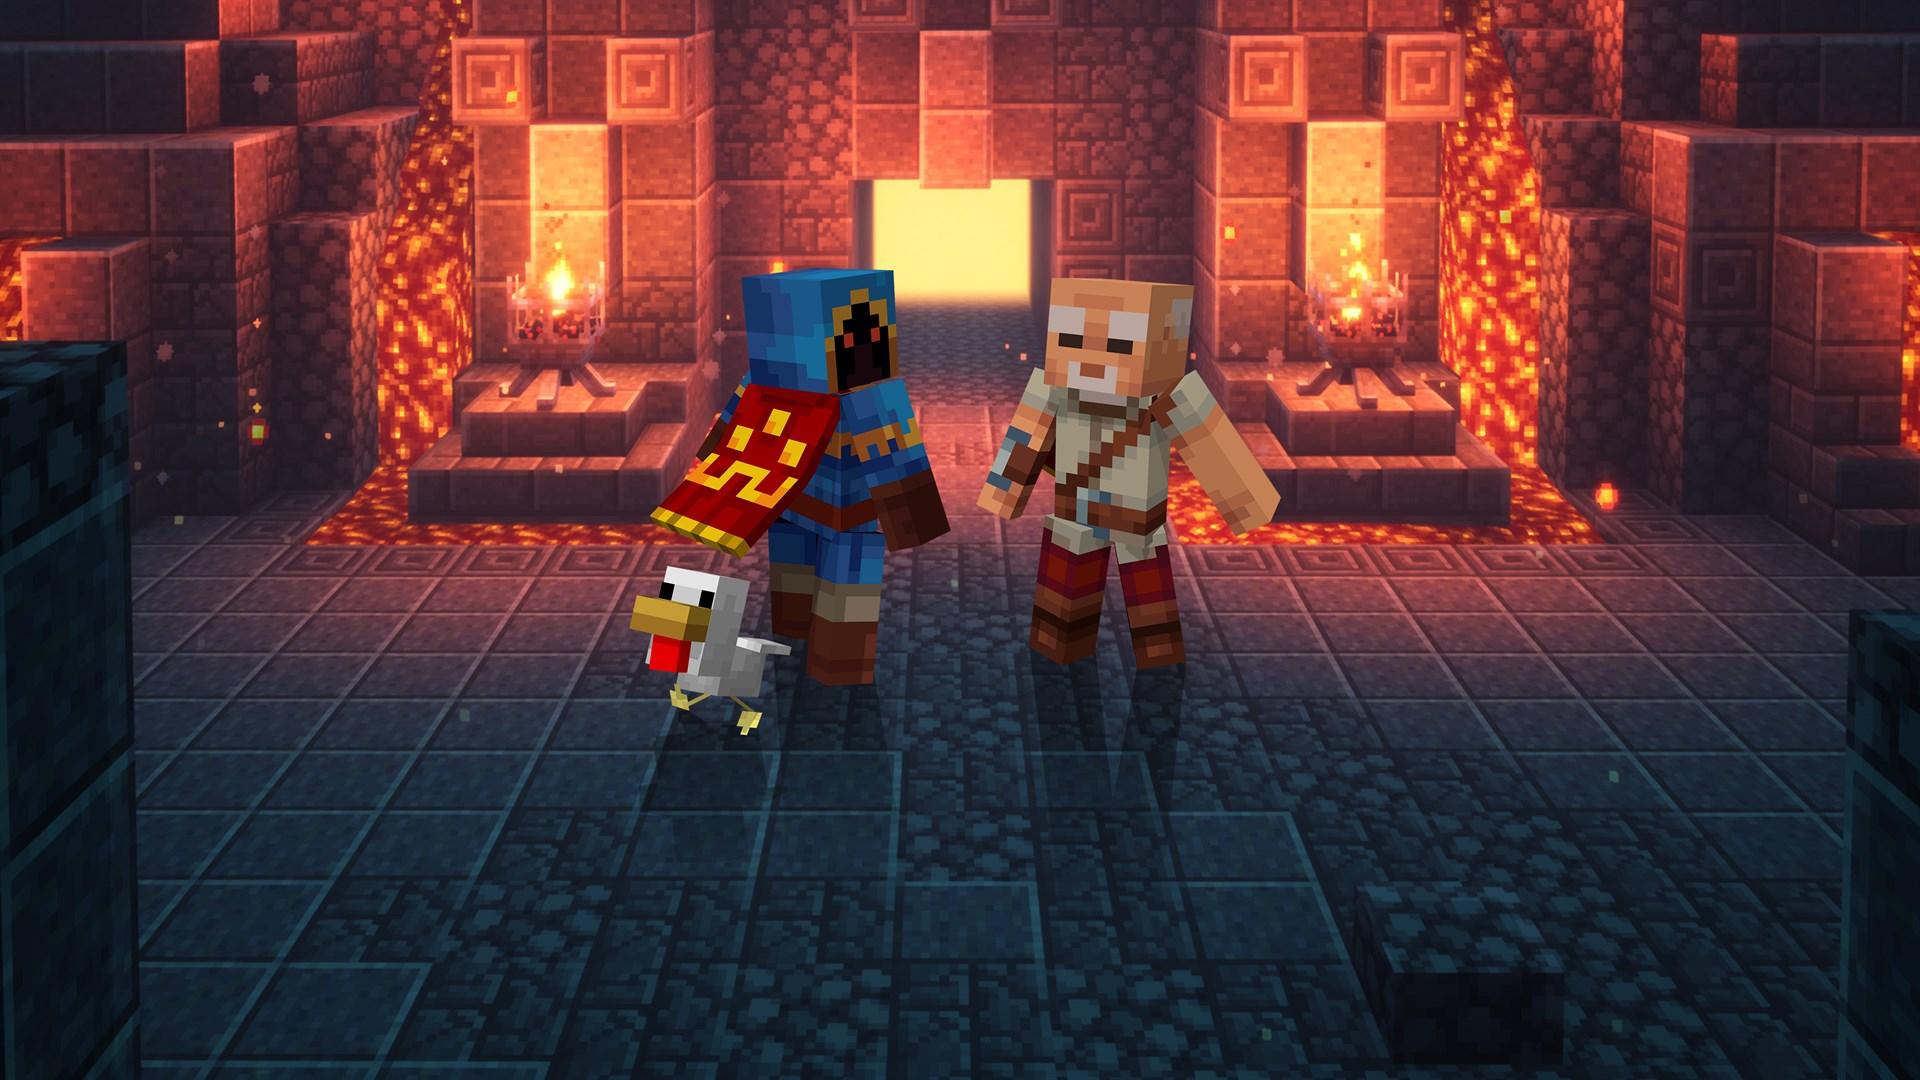 Hero DLC - Windows 10